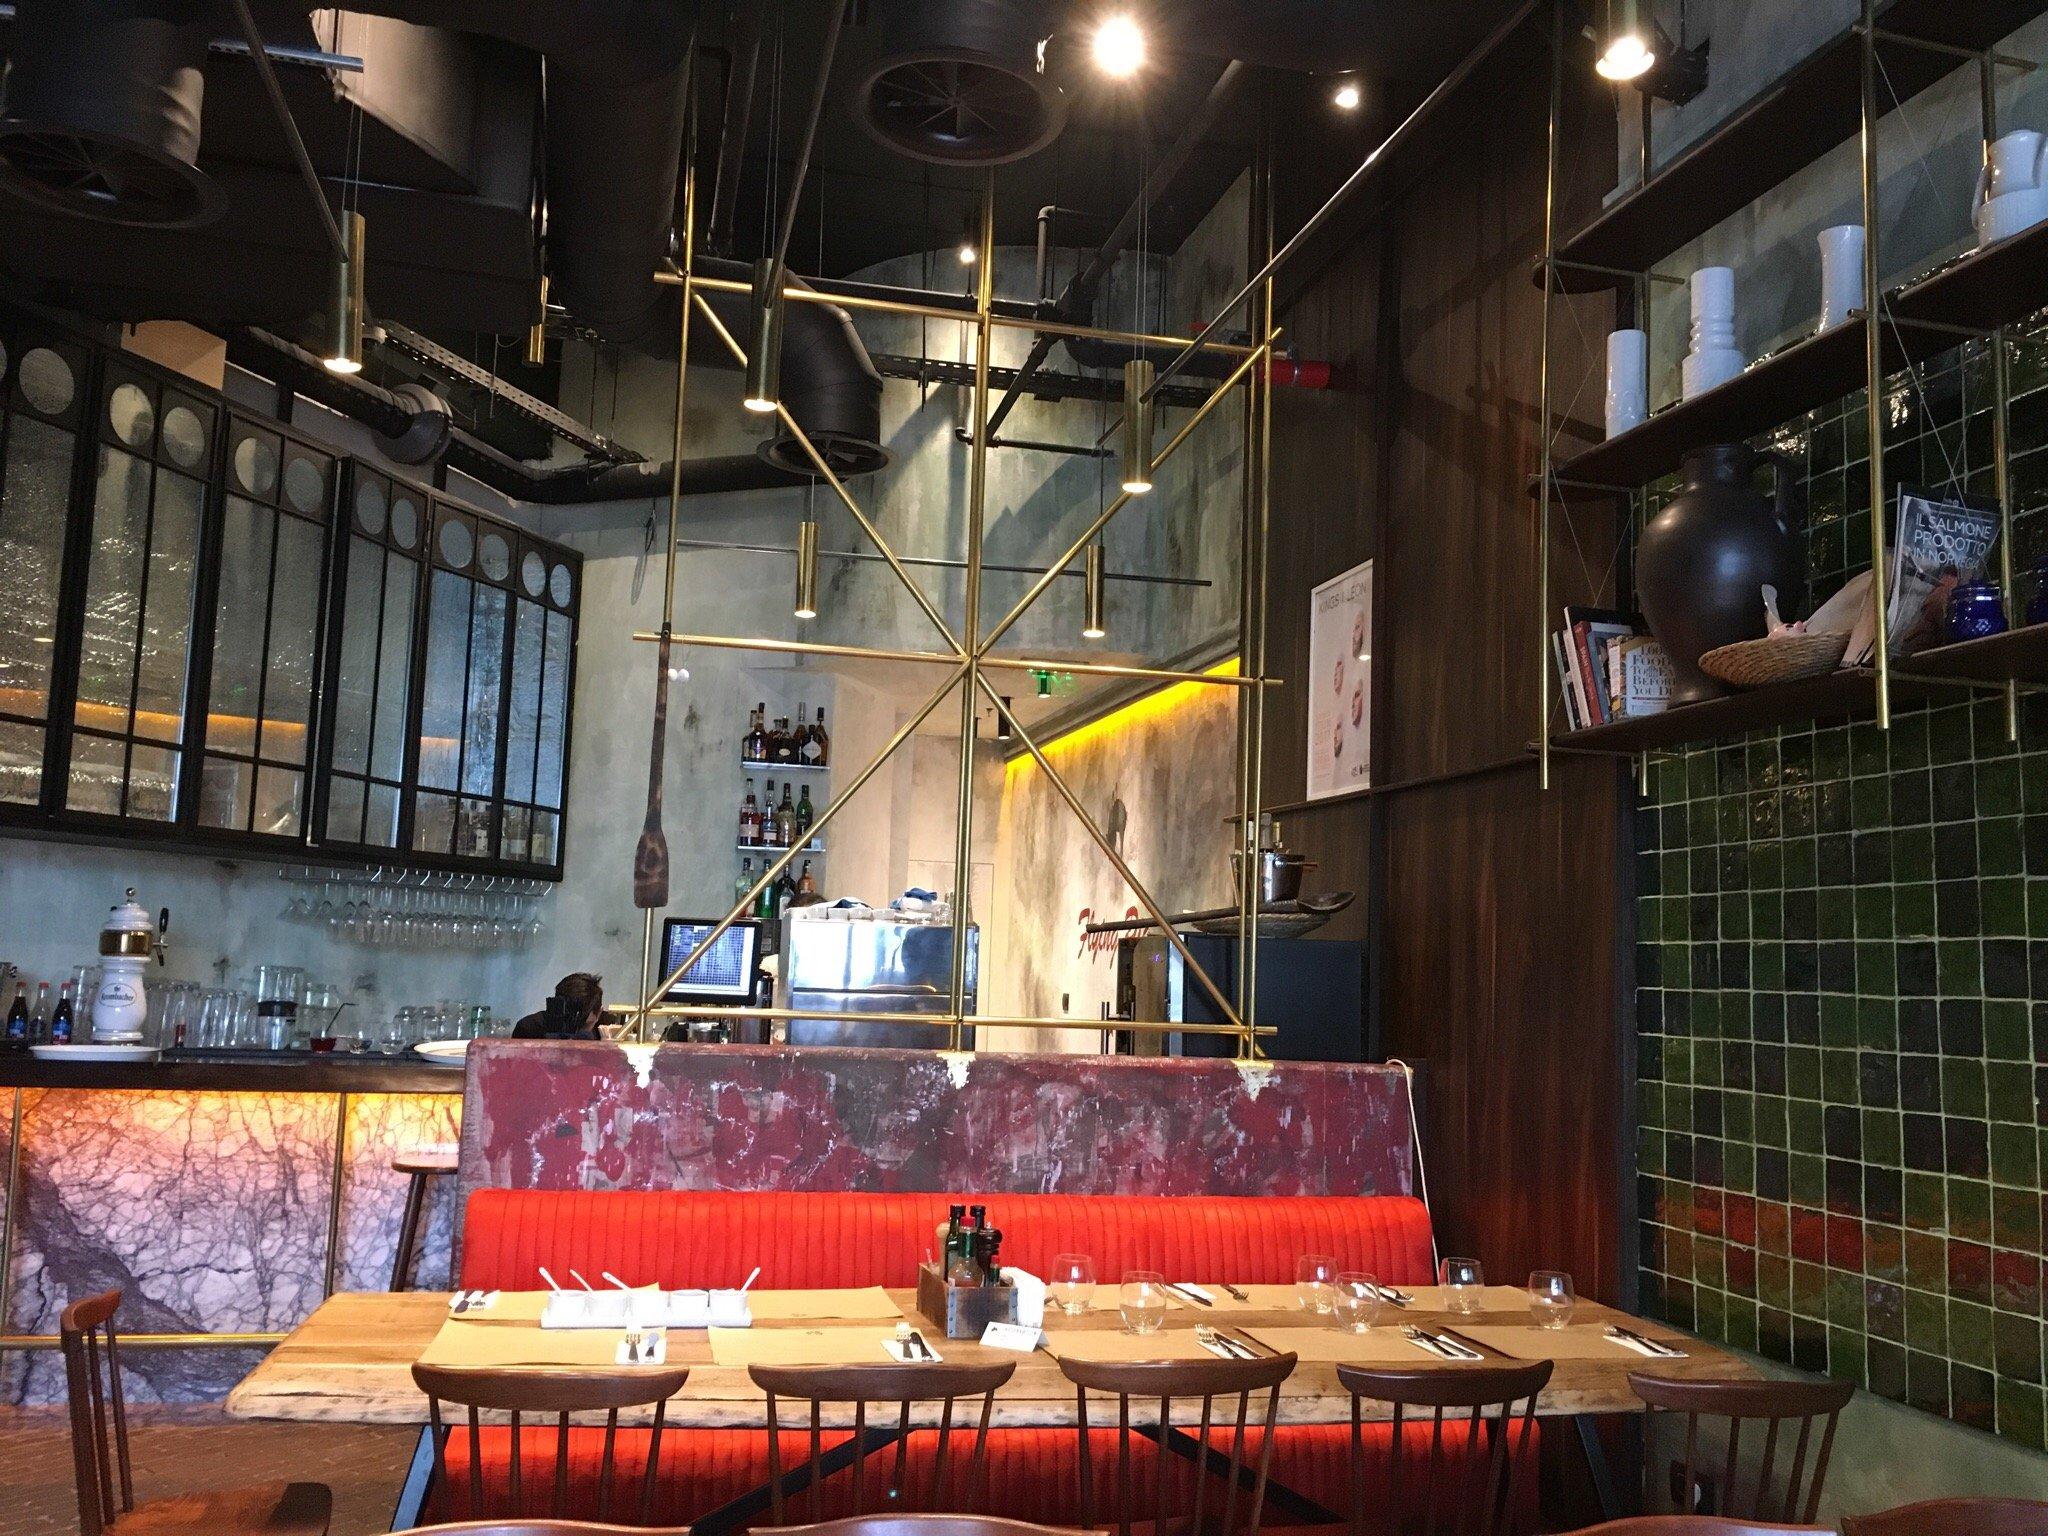 the 10 best restaurants near promenada mall bucharest tripadvisor the flying pig